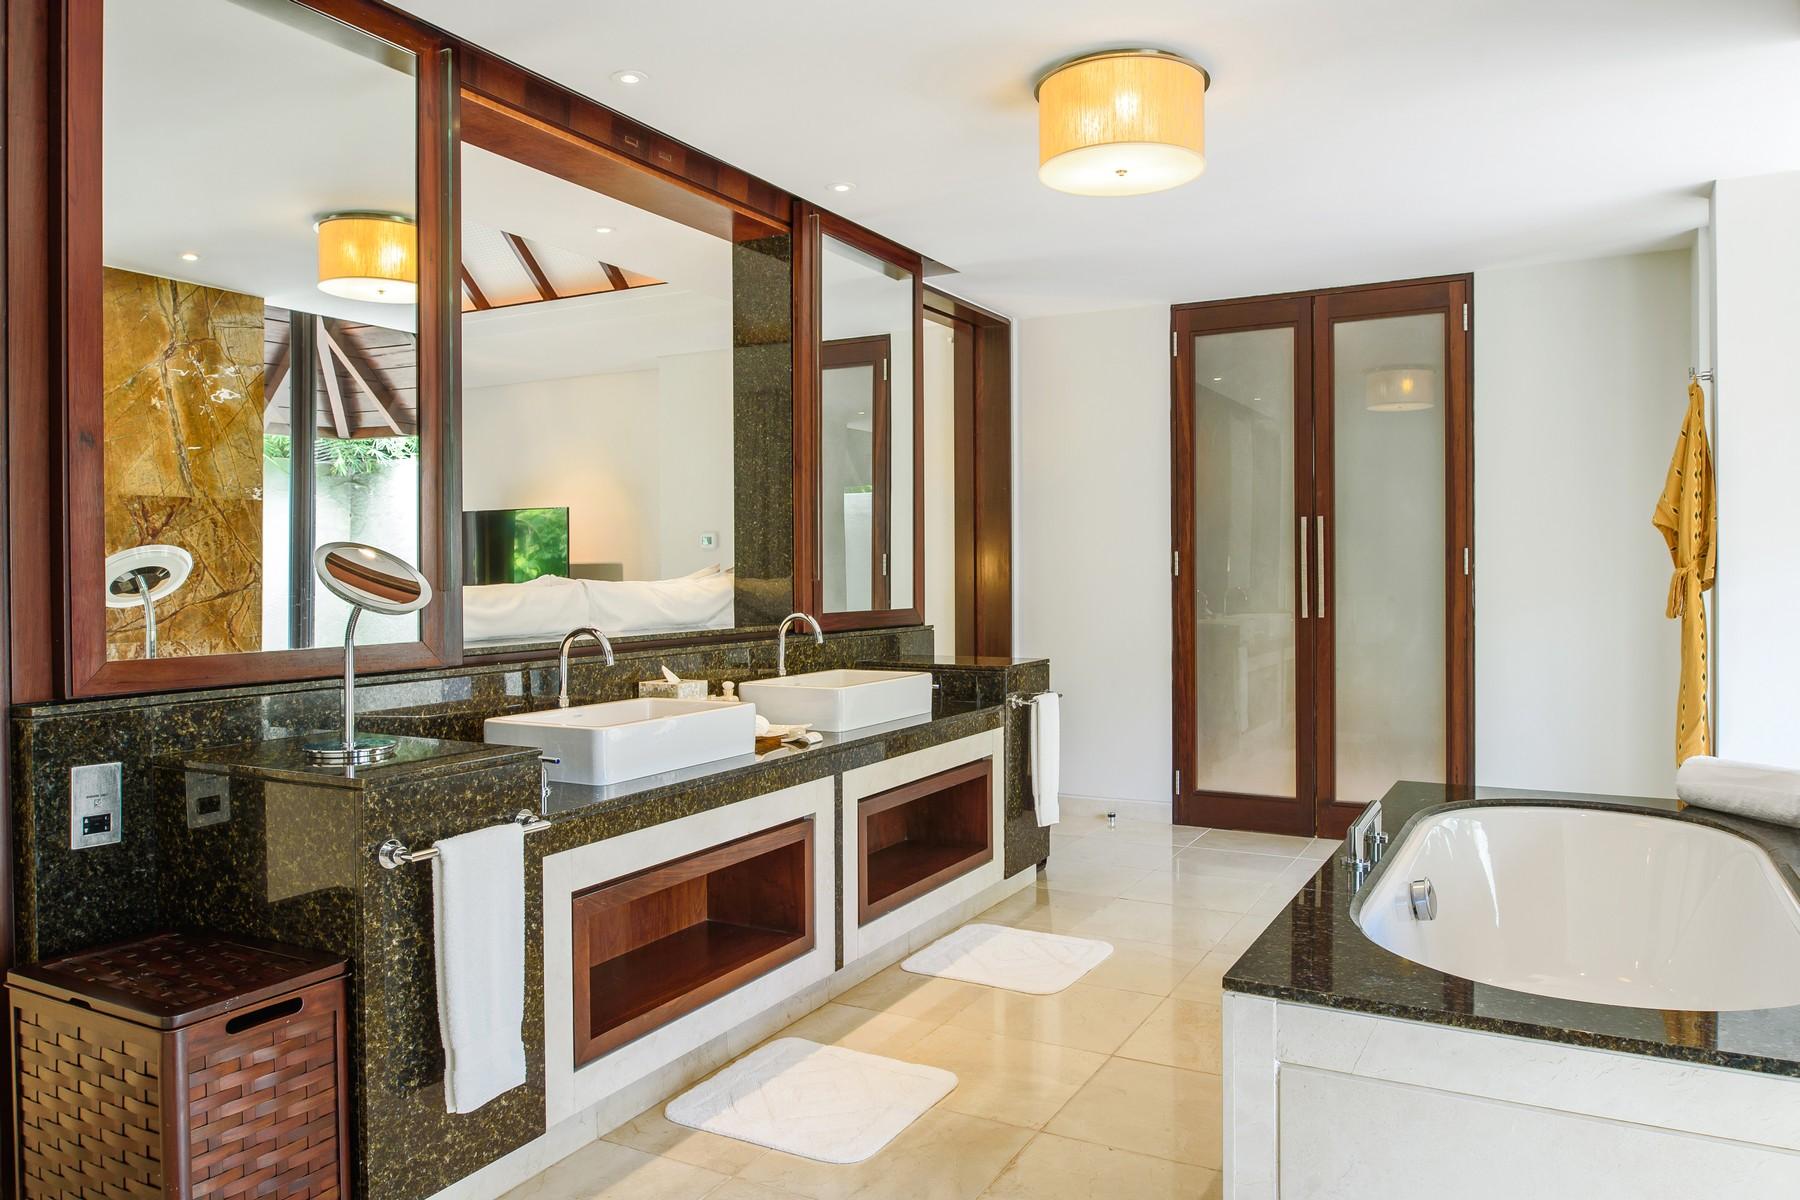 Additional photo for property listing at Villa 215, Four Seasons Private Residence, Anahita Beau Champ, Flacq Mauritius